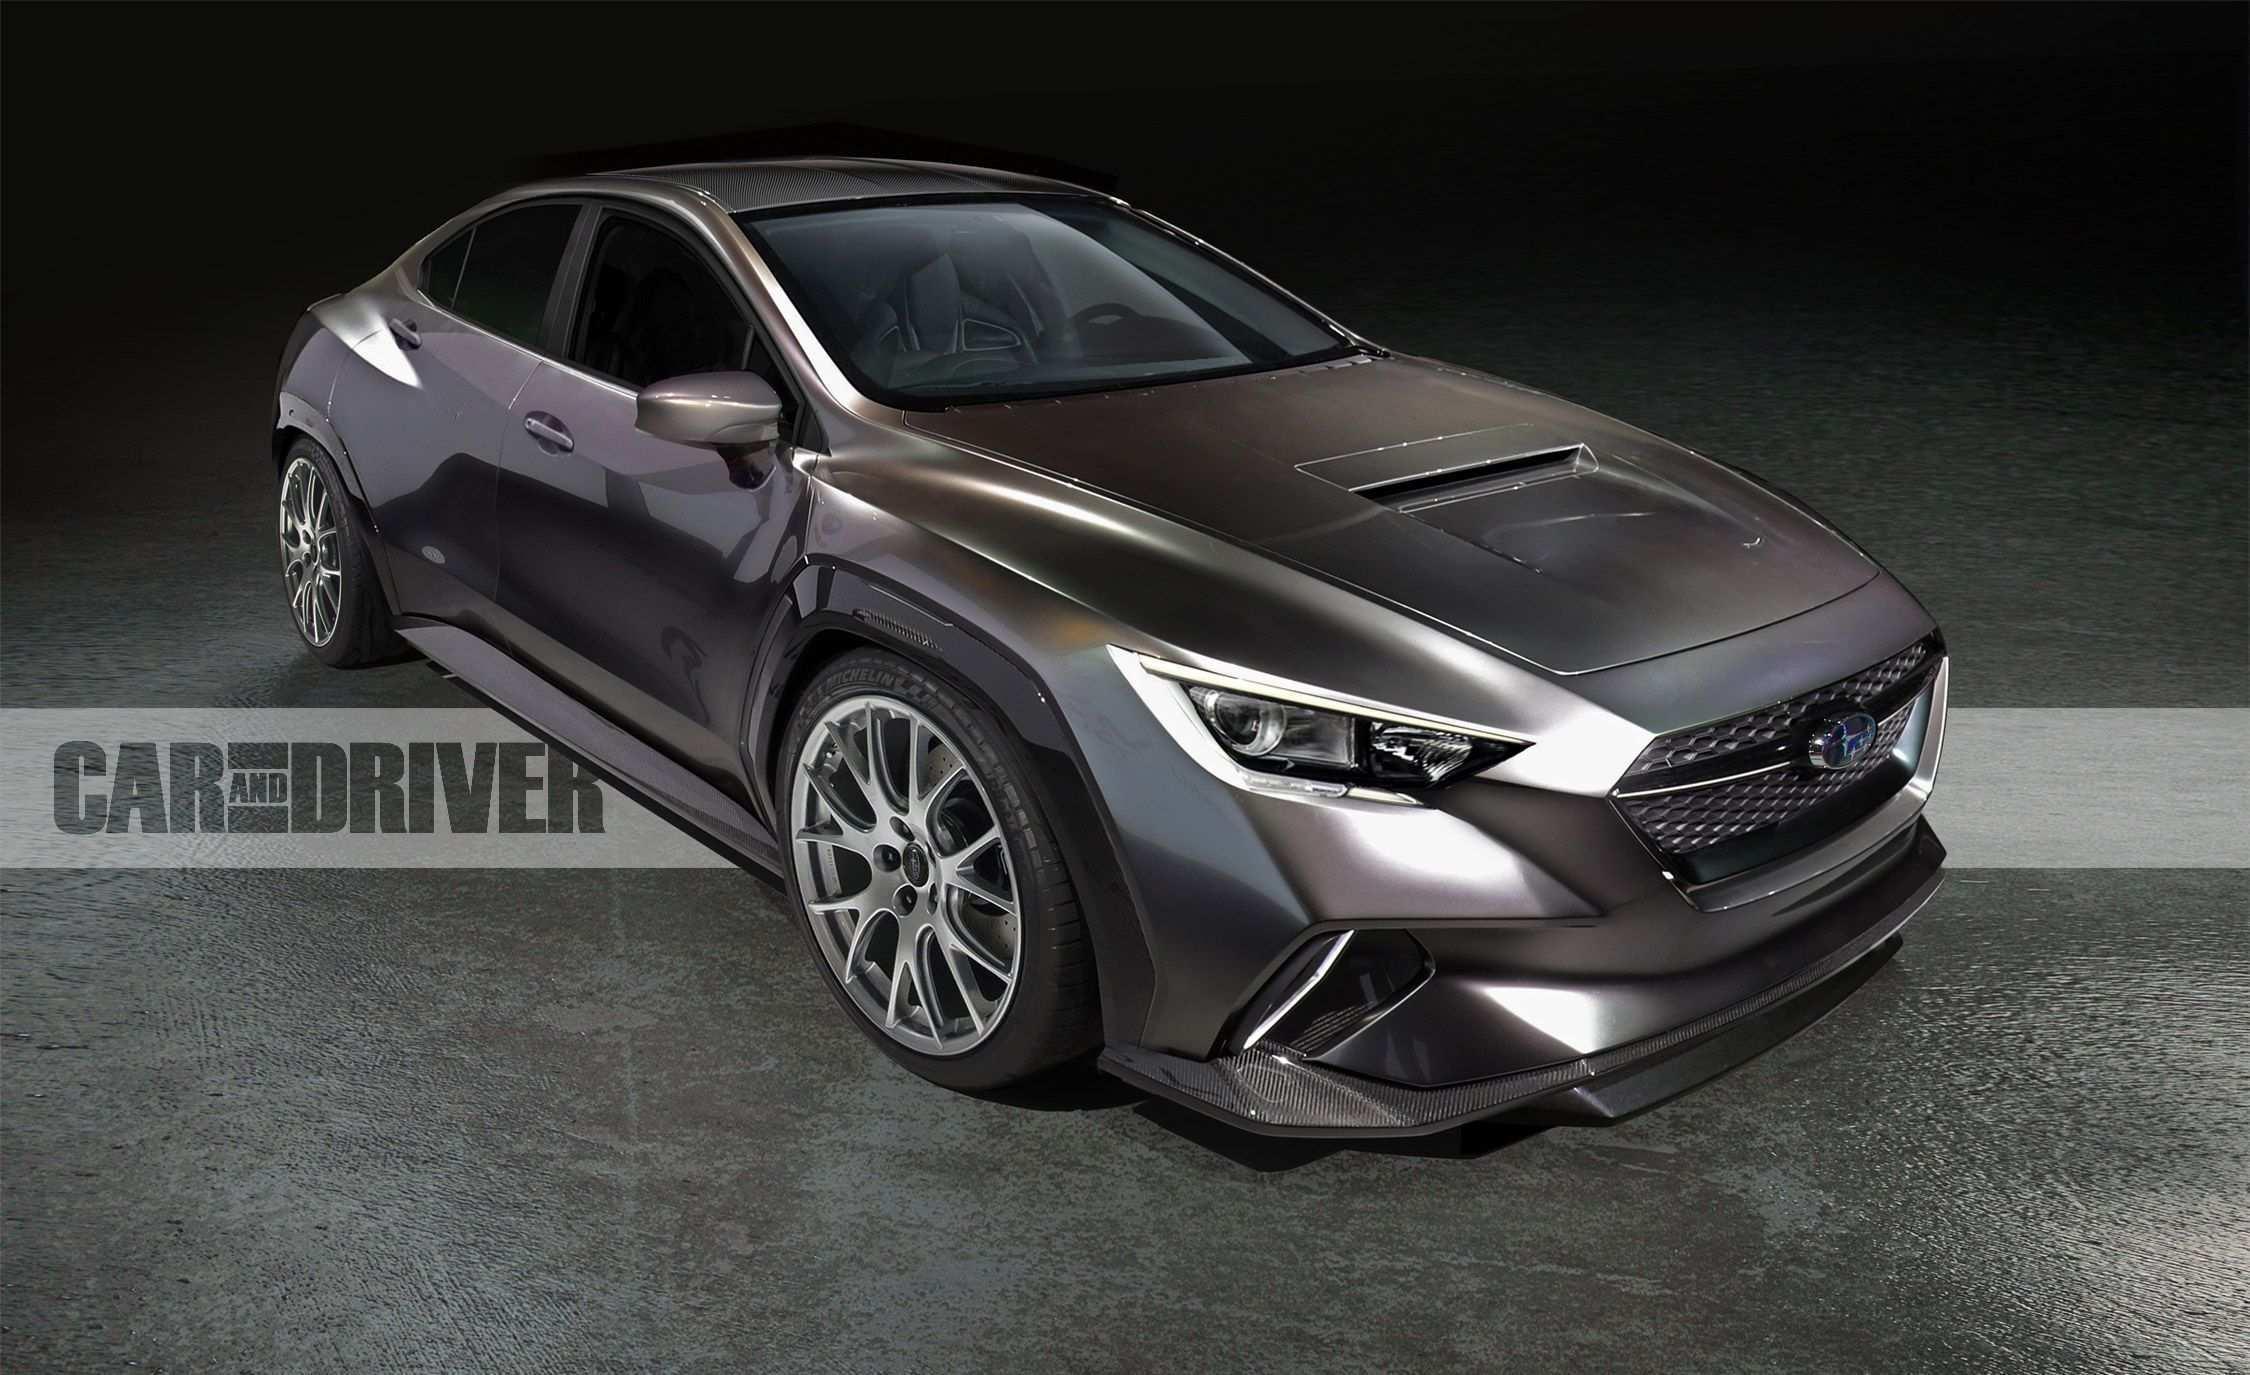 47 New 2020 Subaru Wrx Sti Review Model for 2020 Subaru Wrx Sti Review